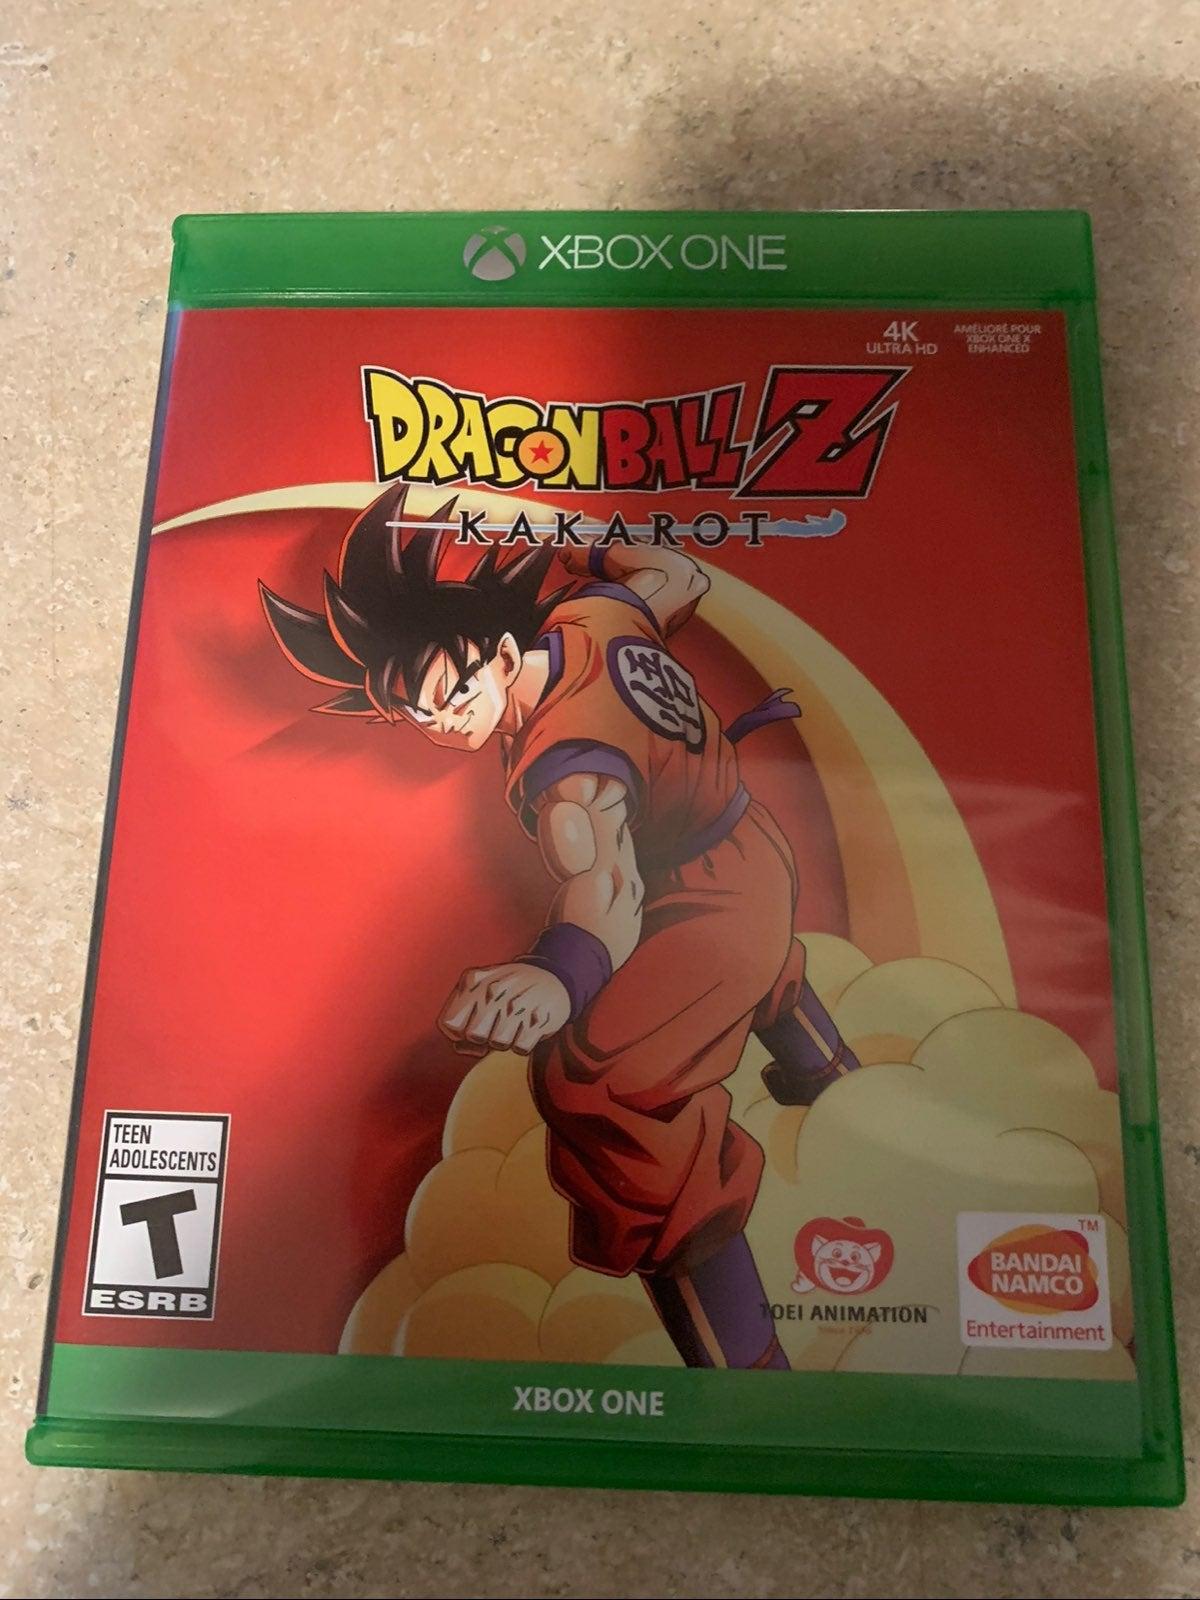 DragonBall Z kakarot - Xbox One